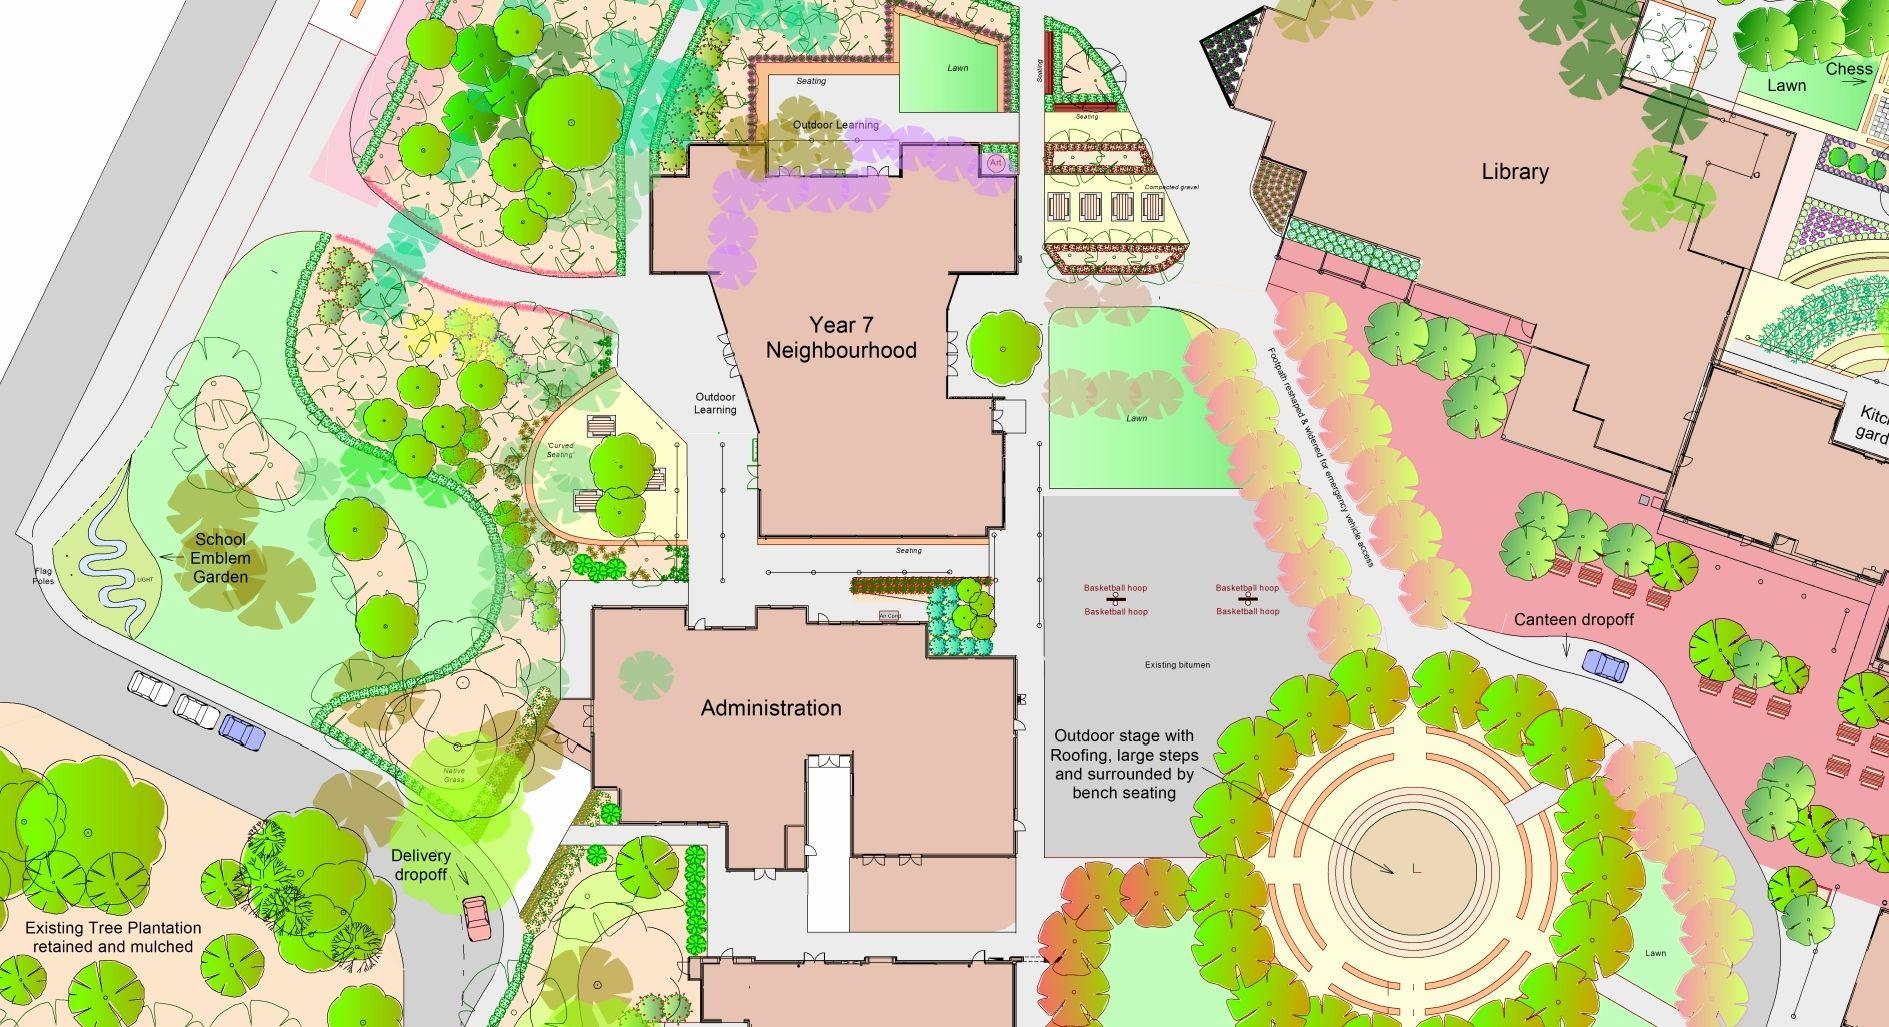 Plan Your Garden With These Free Online Planning Tools Free Garden Planner Free Landscape Design Landscape Design Software